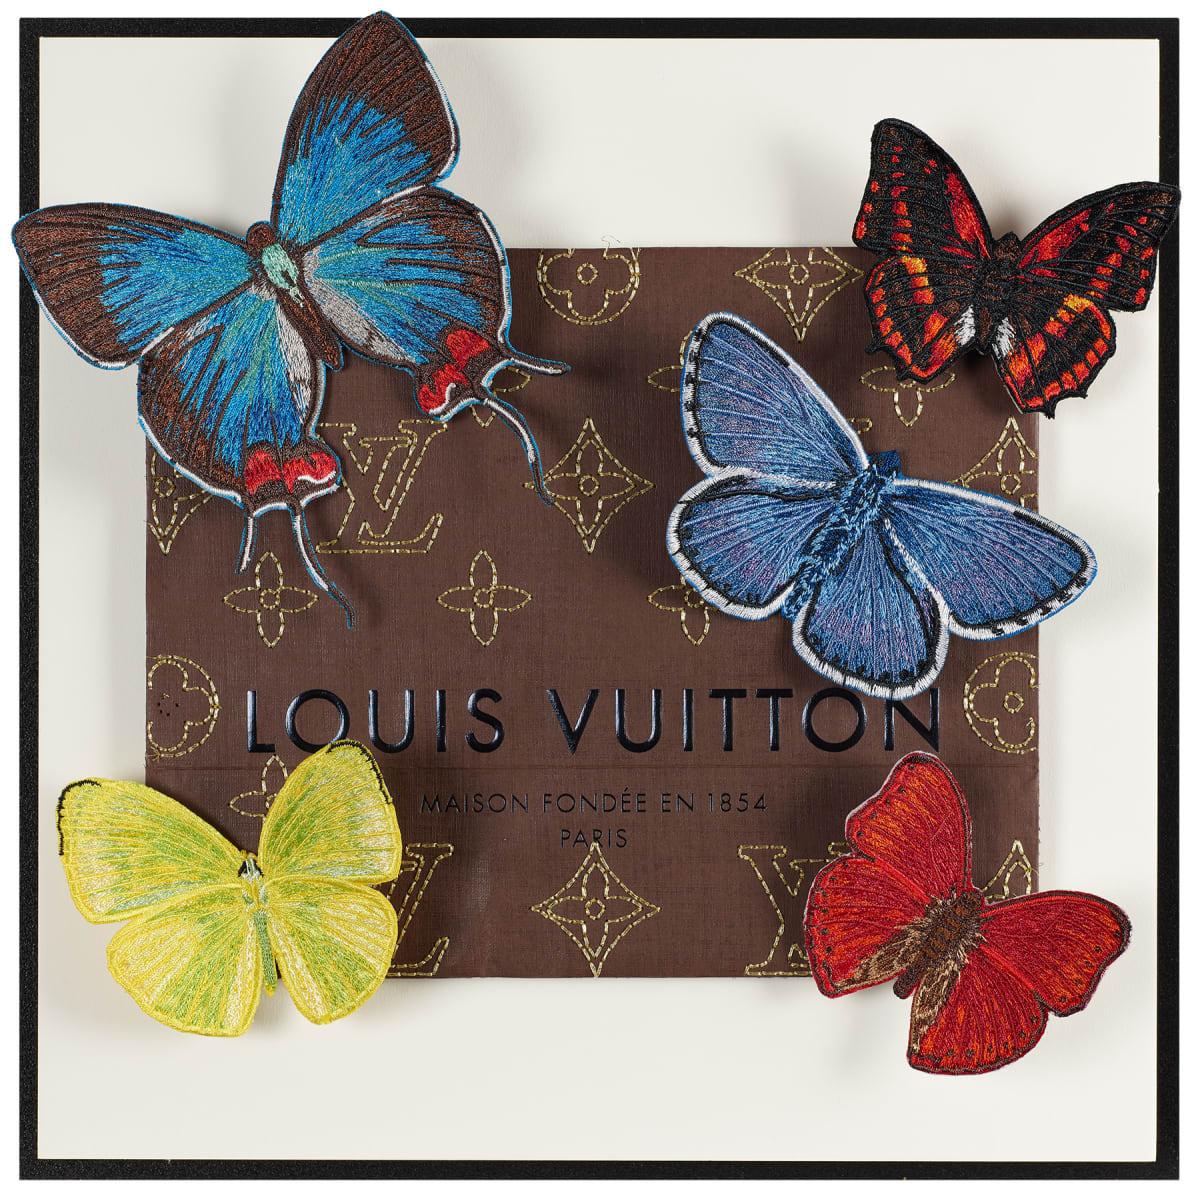 Stephen Wilson, Louis Vuitton Congregation V, 2020